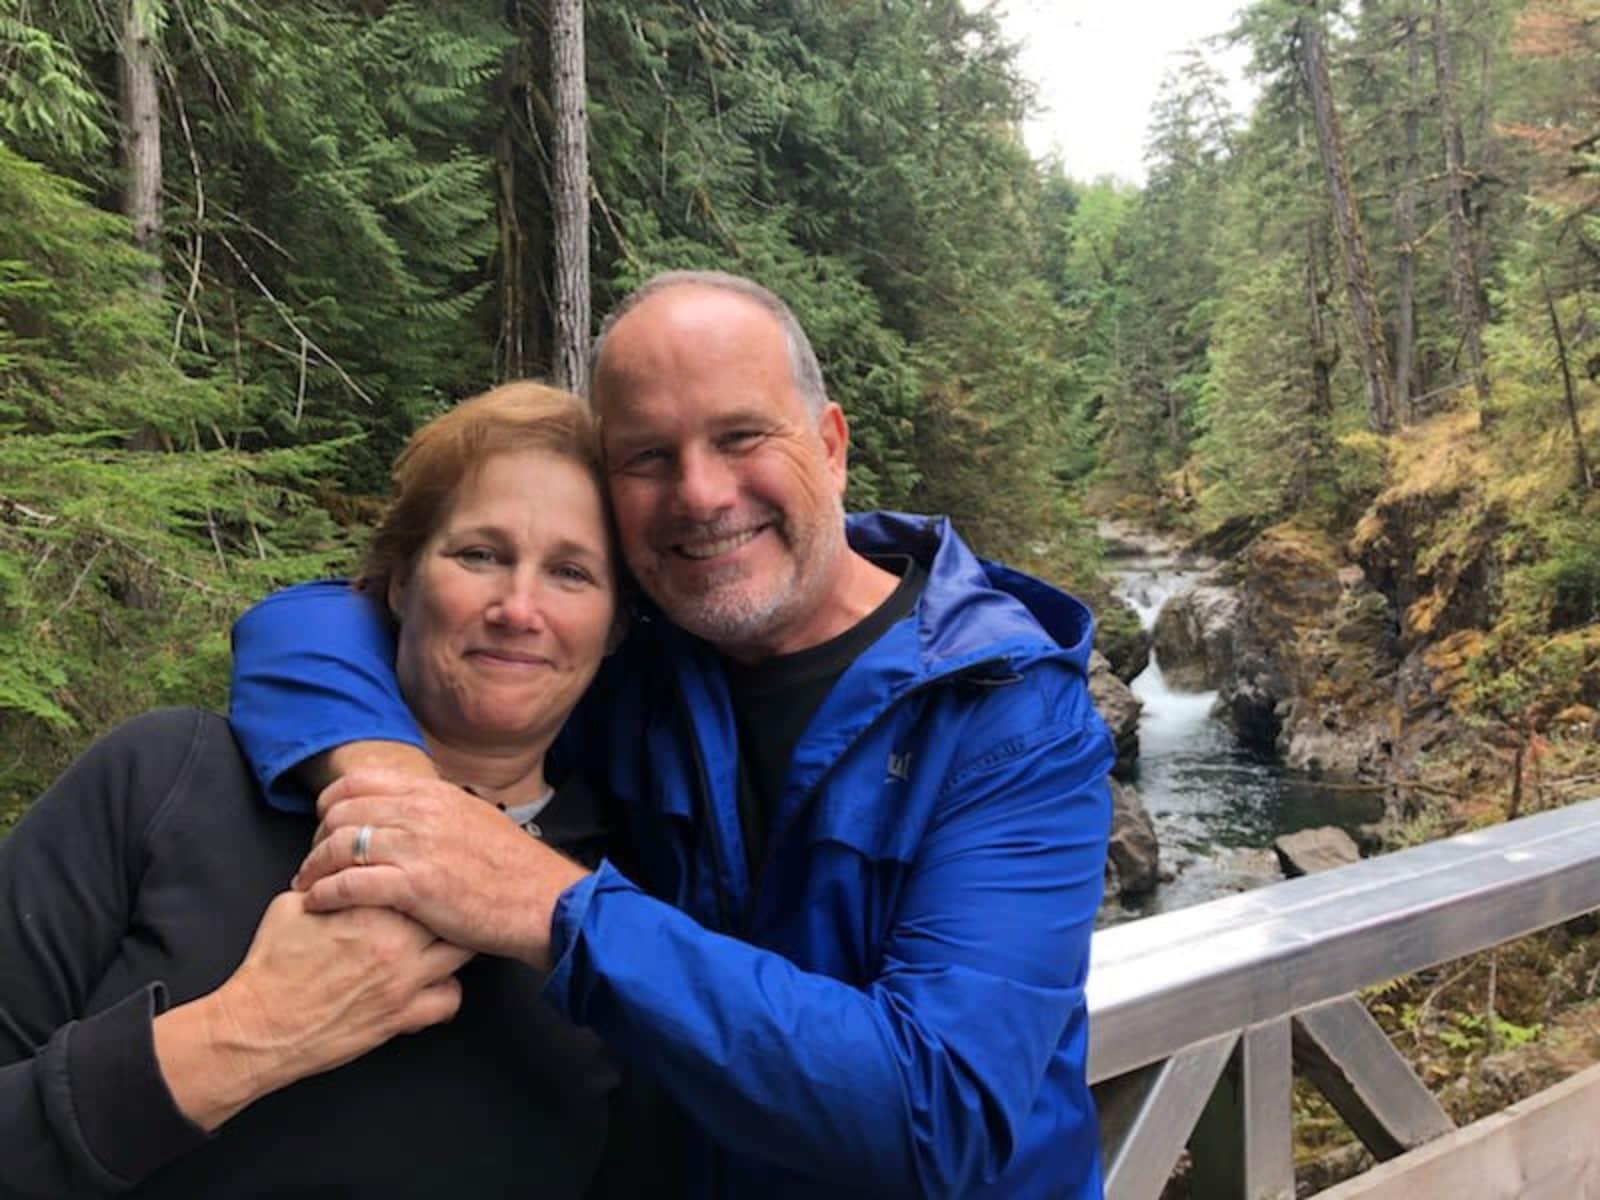 Susan & William from Montréal, Quebec, Canada